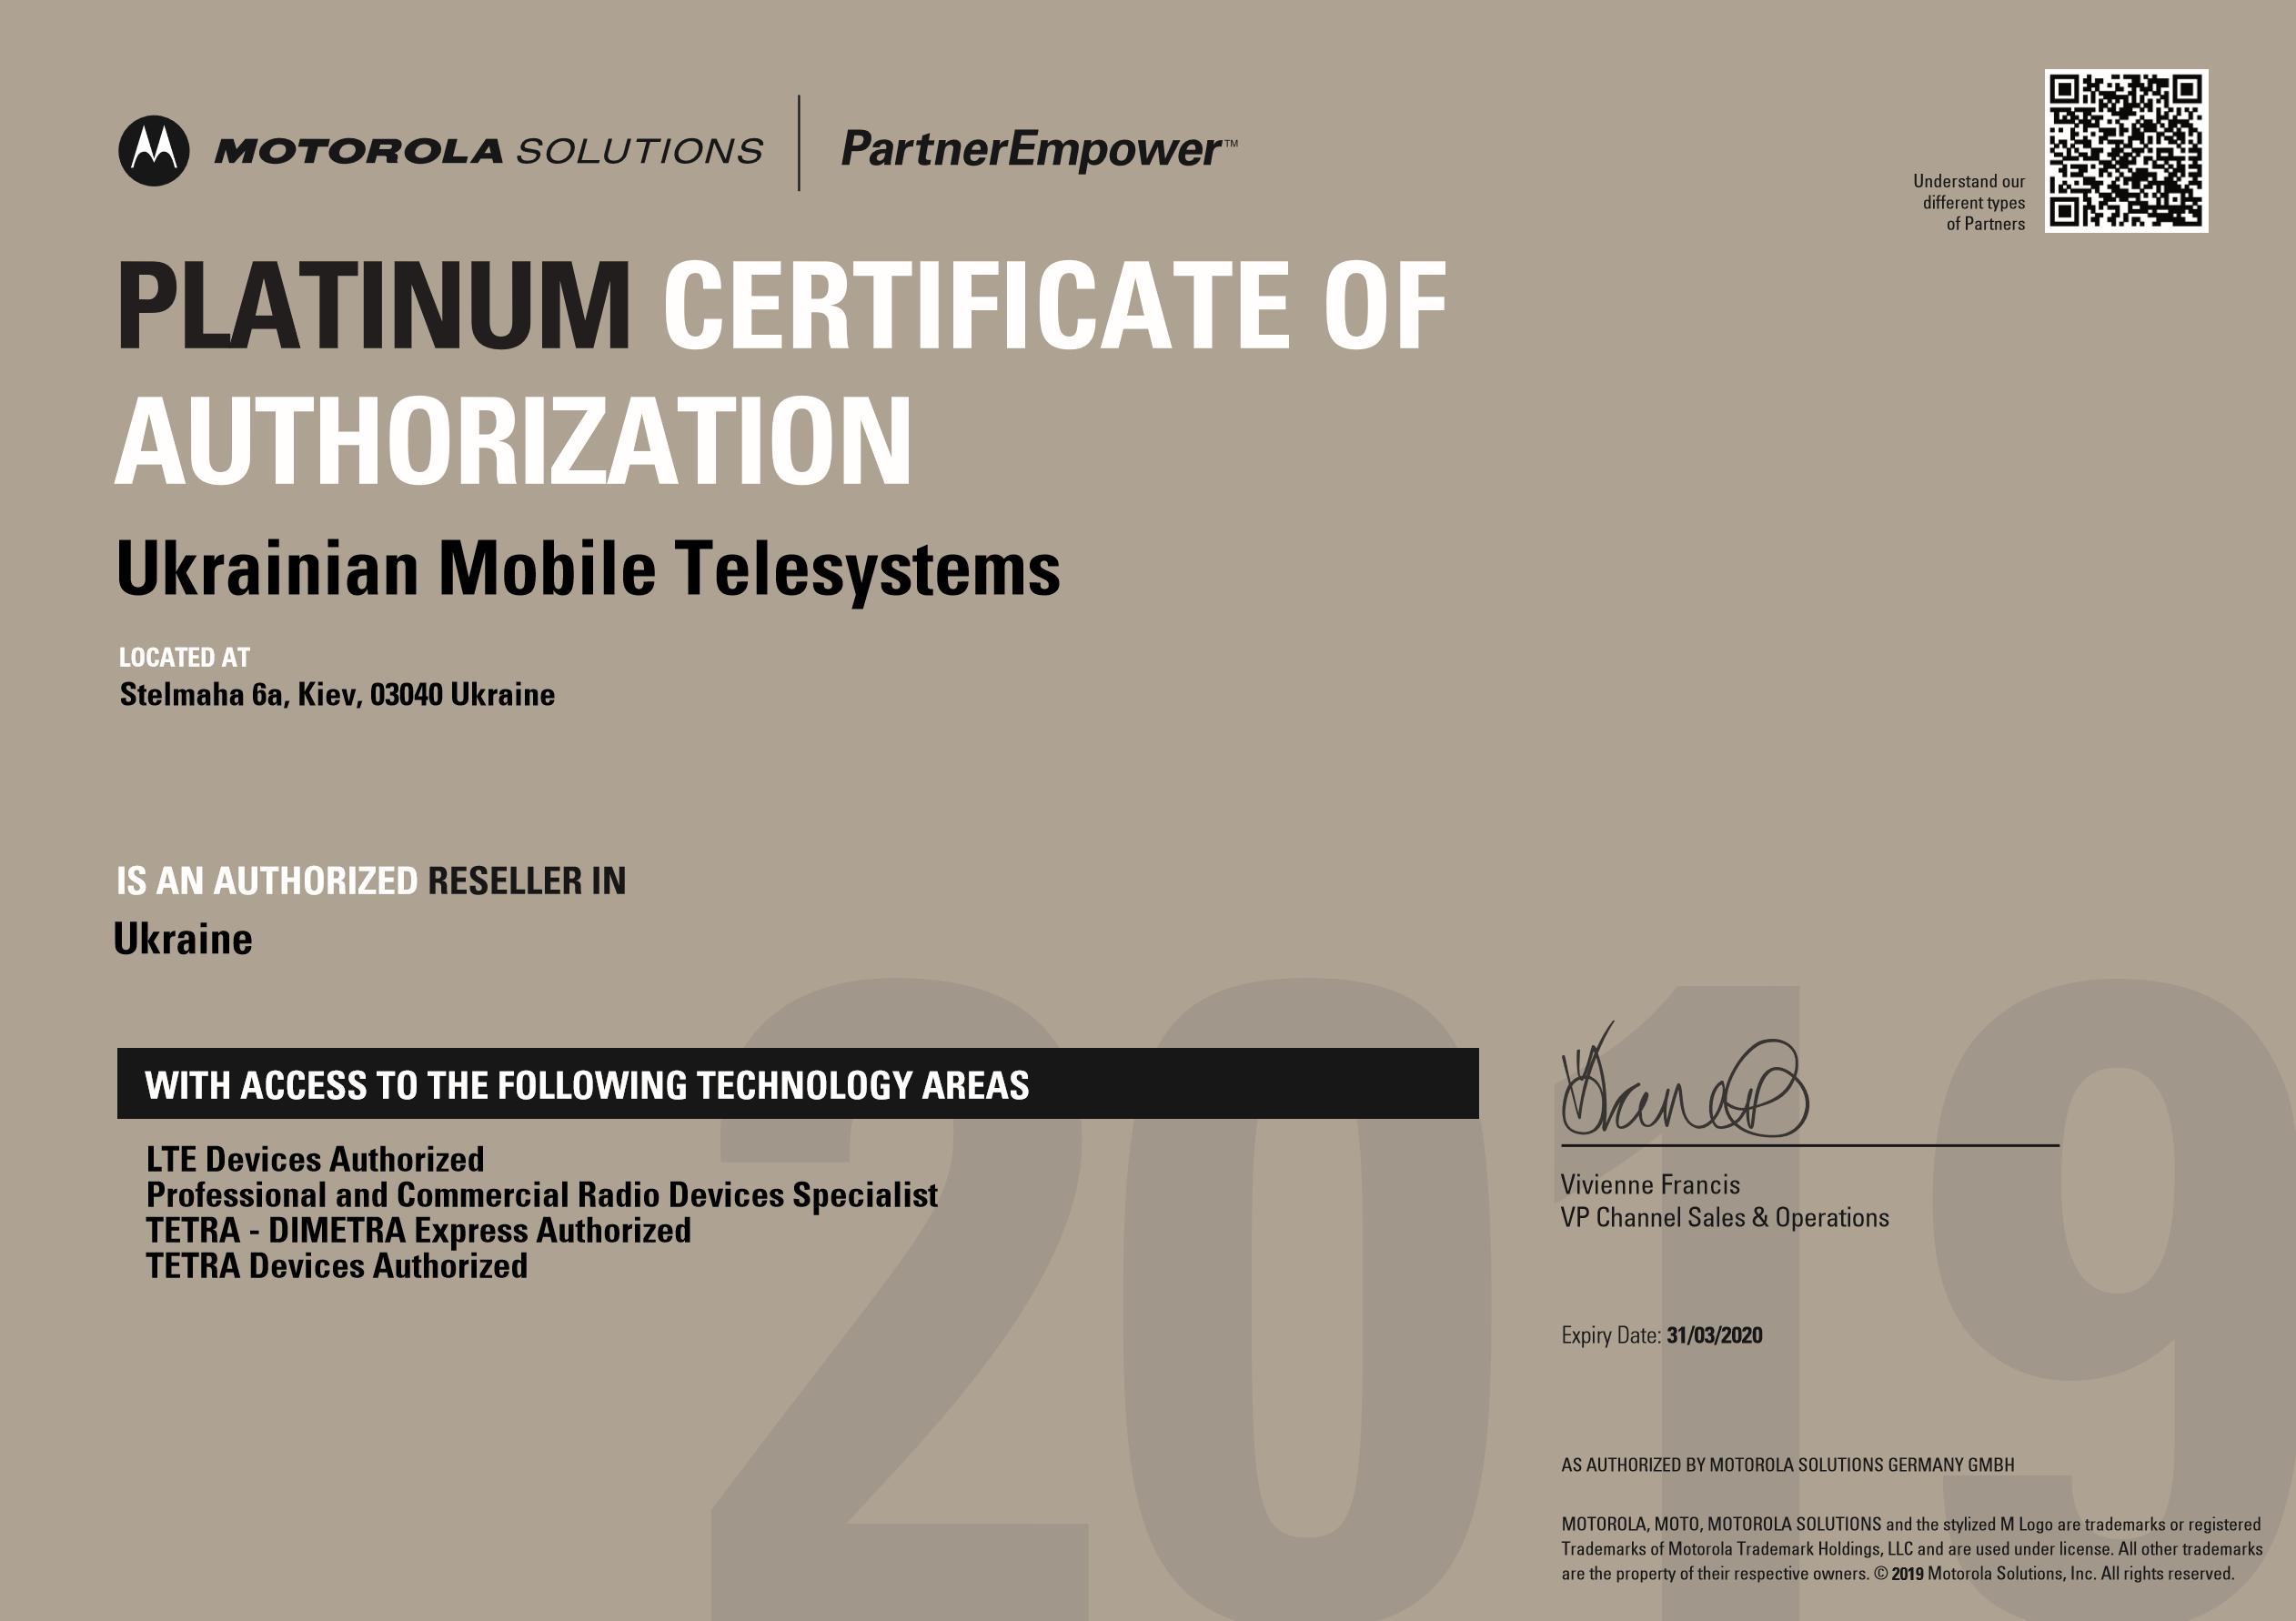 Сертификат дистрибьютора Motorola 2019